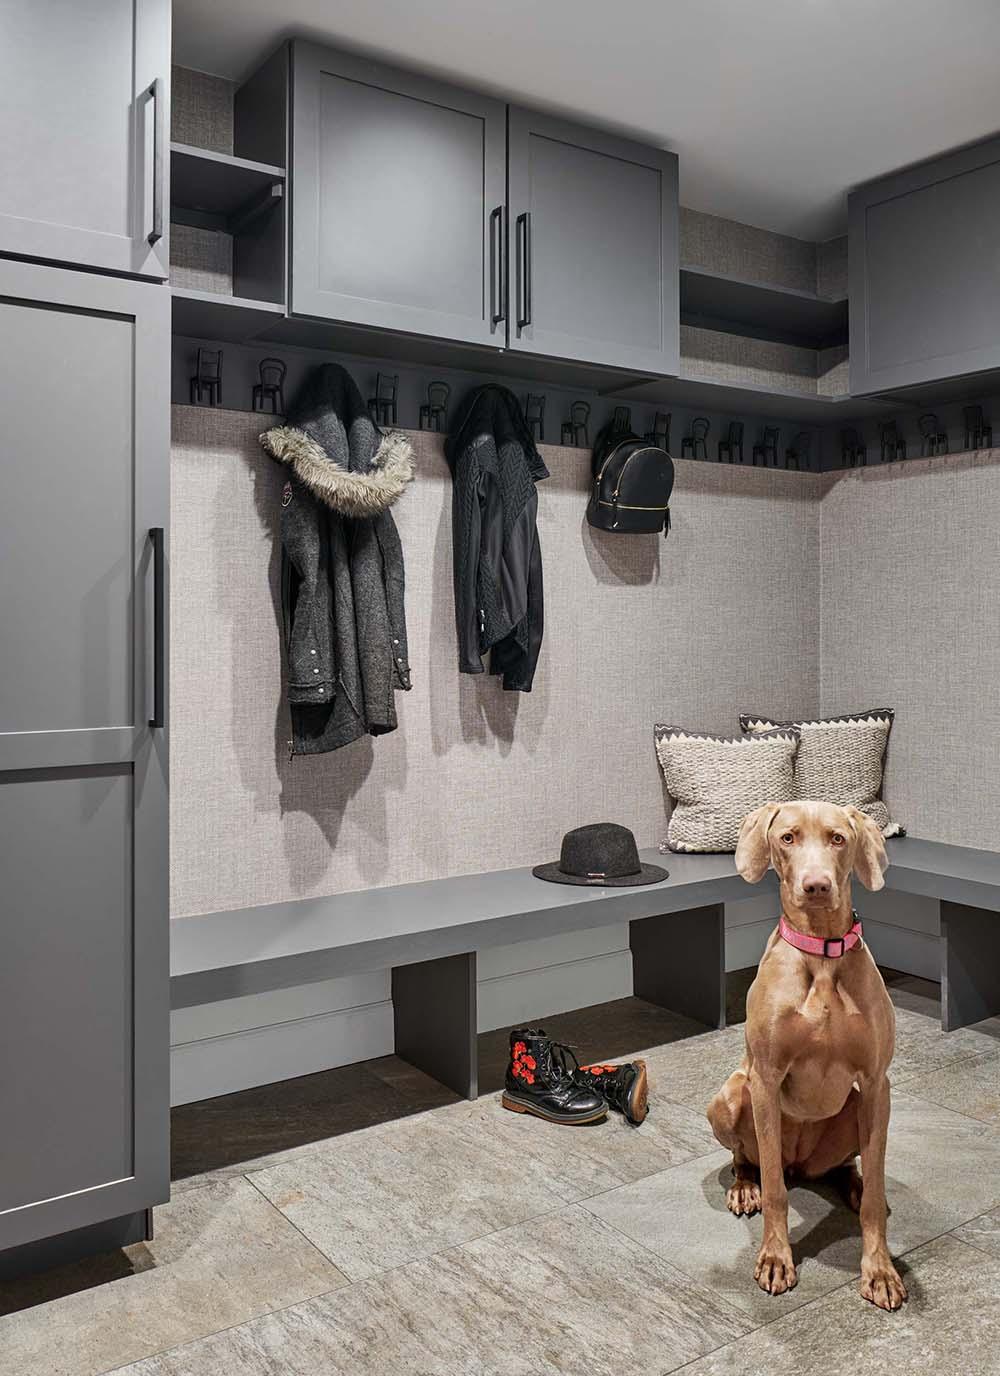 Architectural Photography Aspen, Colorado, Interiors Photography, Hospitality